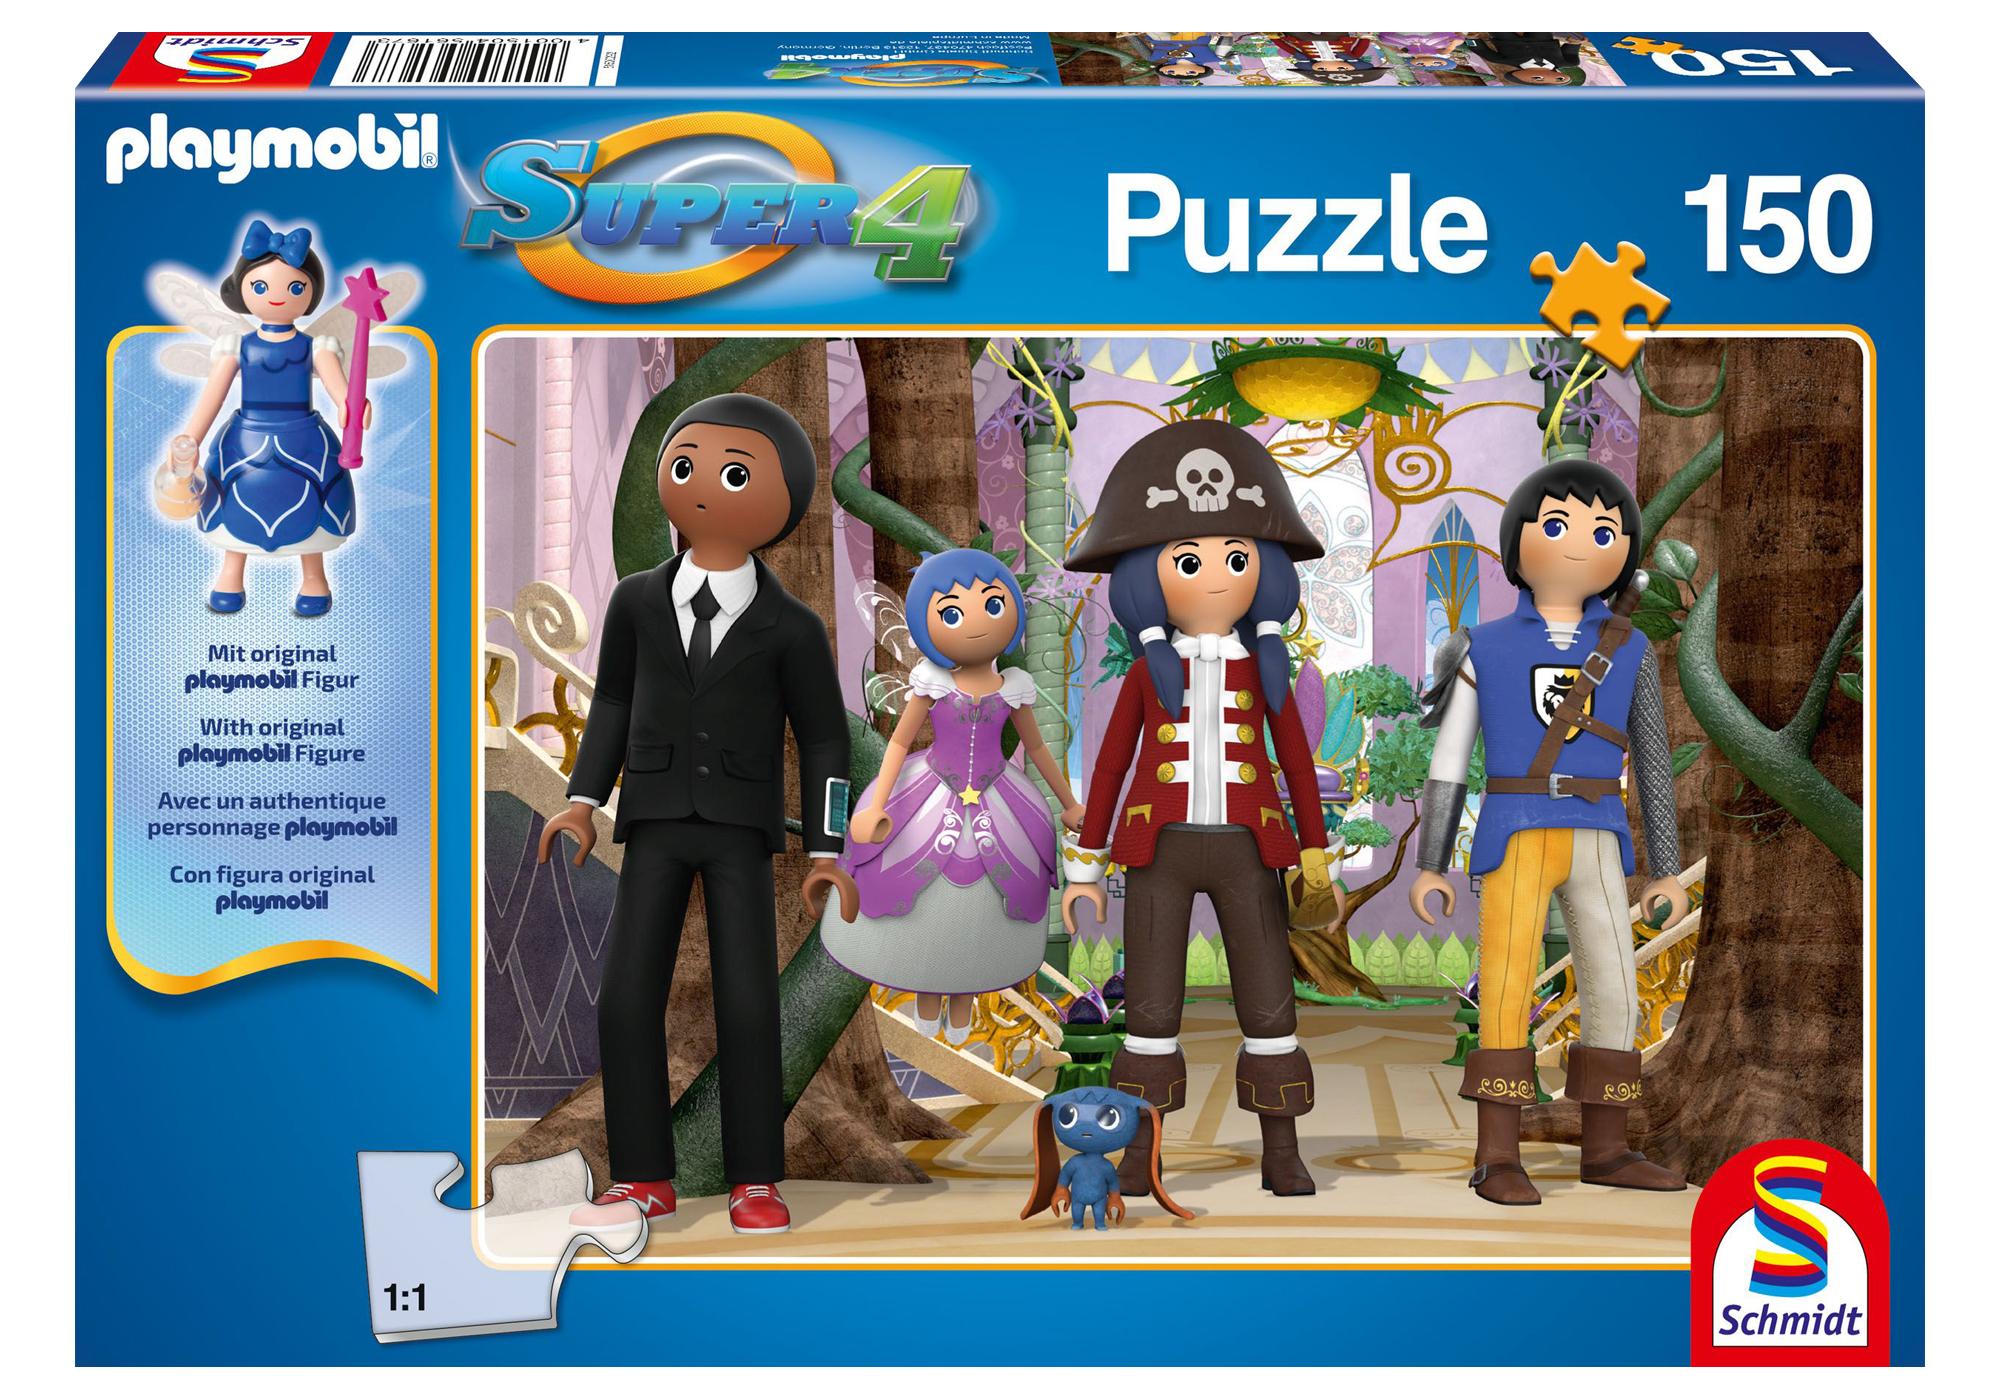 http://media.playmobil.com/i/playmobil/80708_product_detail/Puzzle Super4 - Enchanted Island